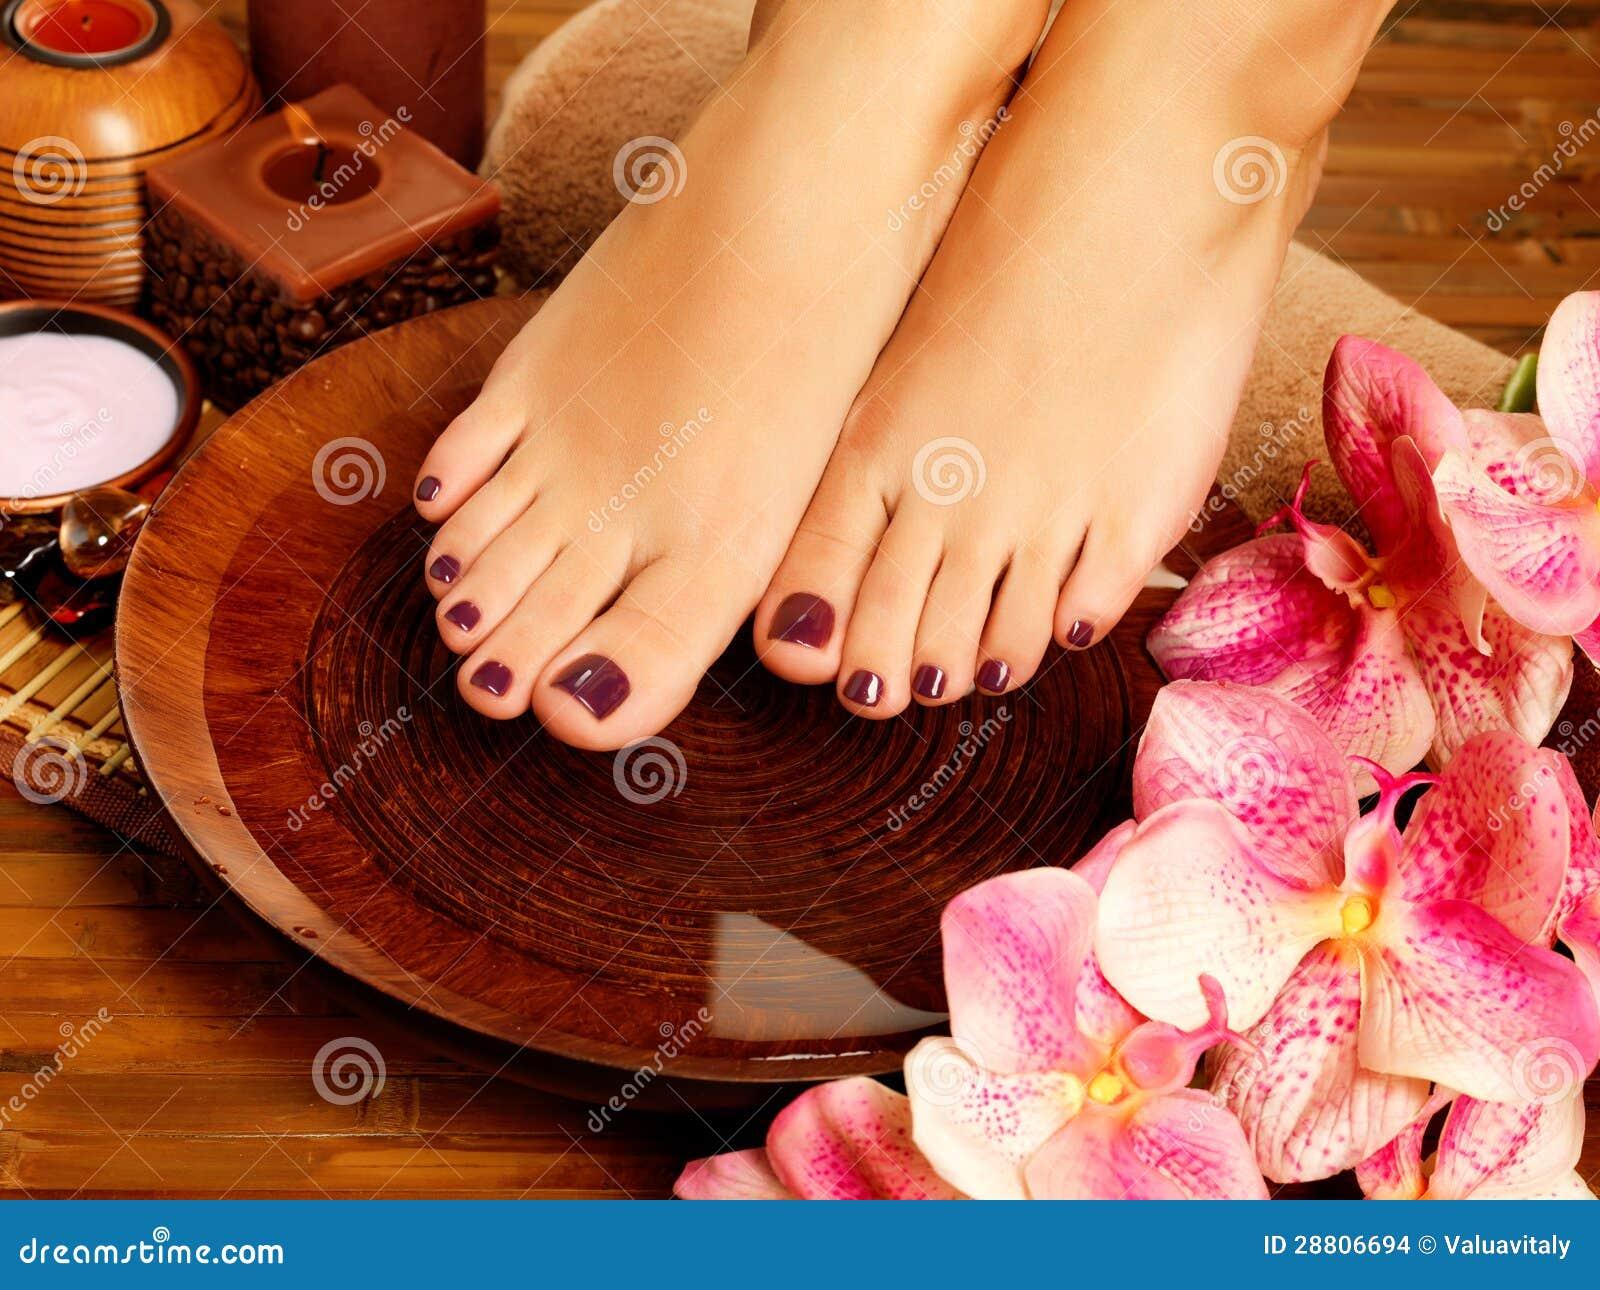 Female Feet At Spa Salon Pedicure Procedure Stock